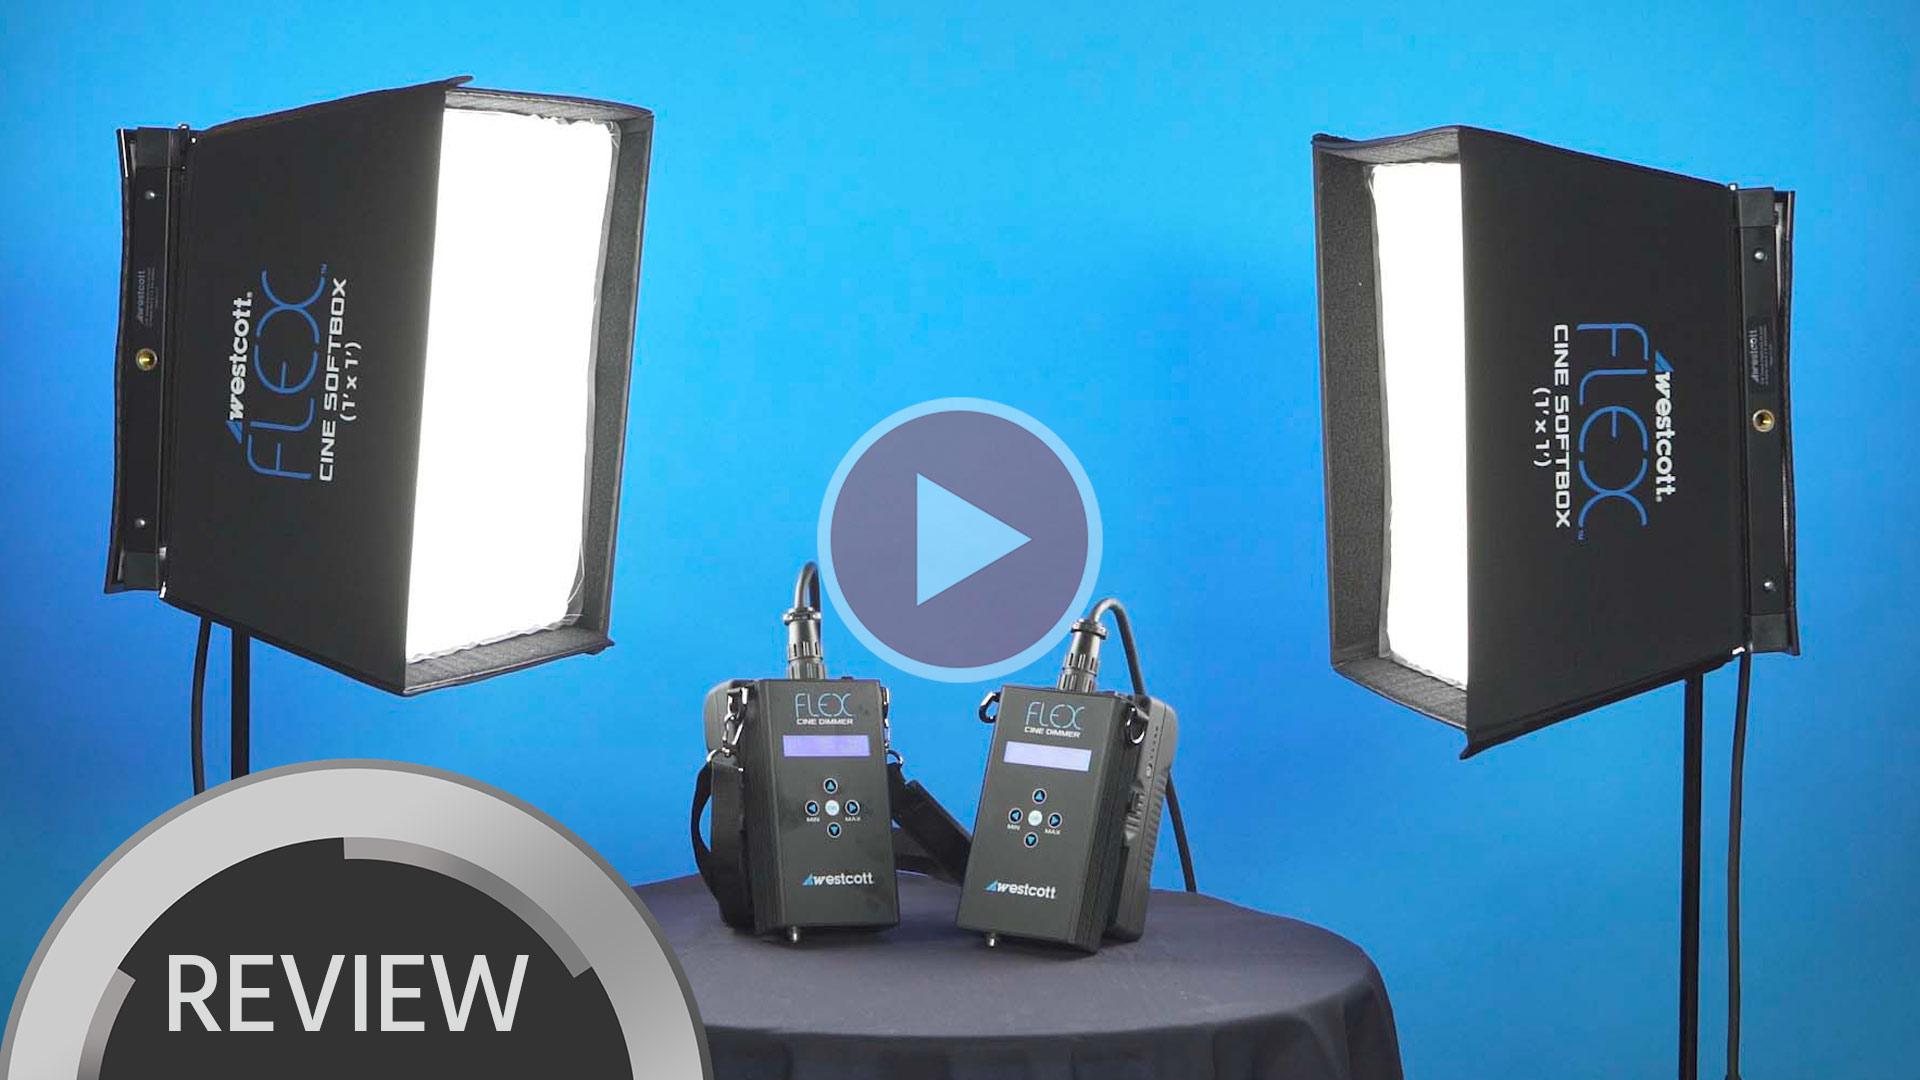 Westcott Flex Cine Travel LED Lighting Kit Video Review & Demo | cinema5D